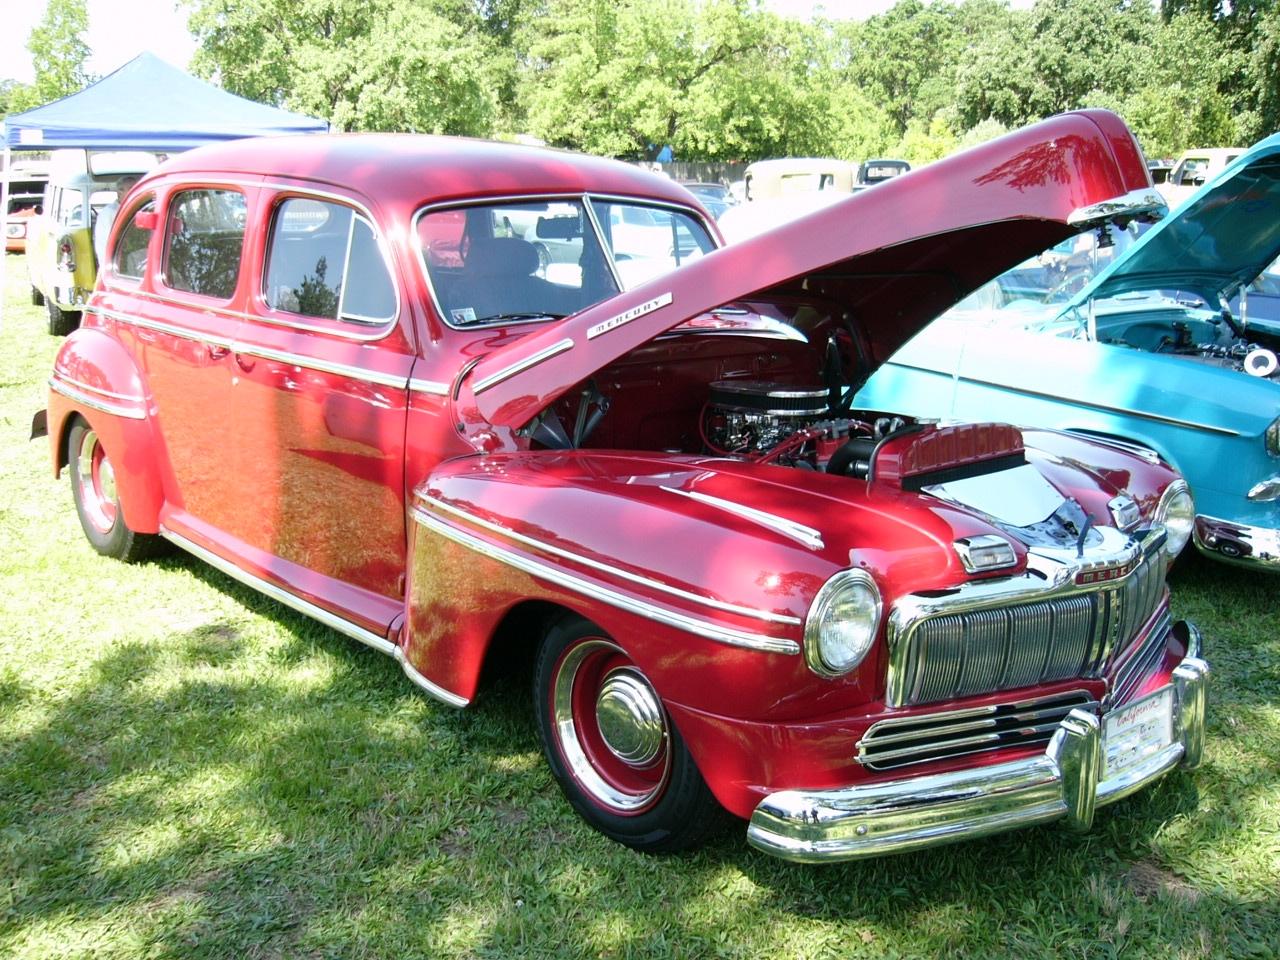 Red Mercury Town Sedan by RoadTripDog